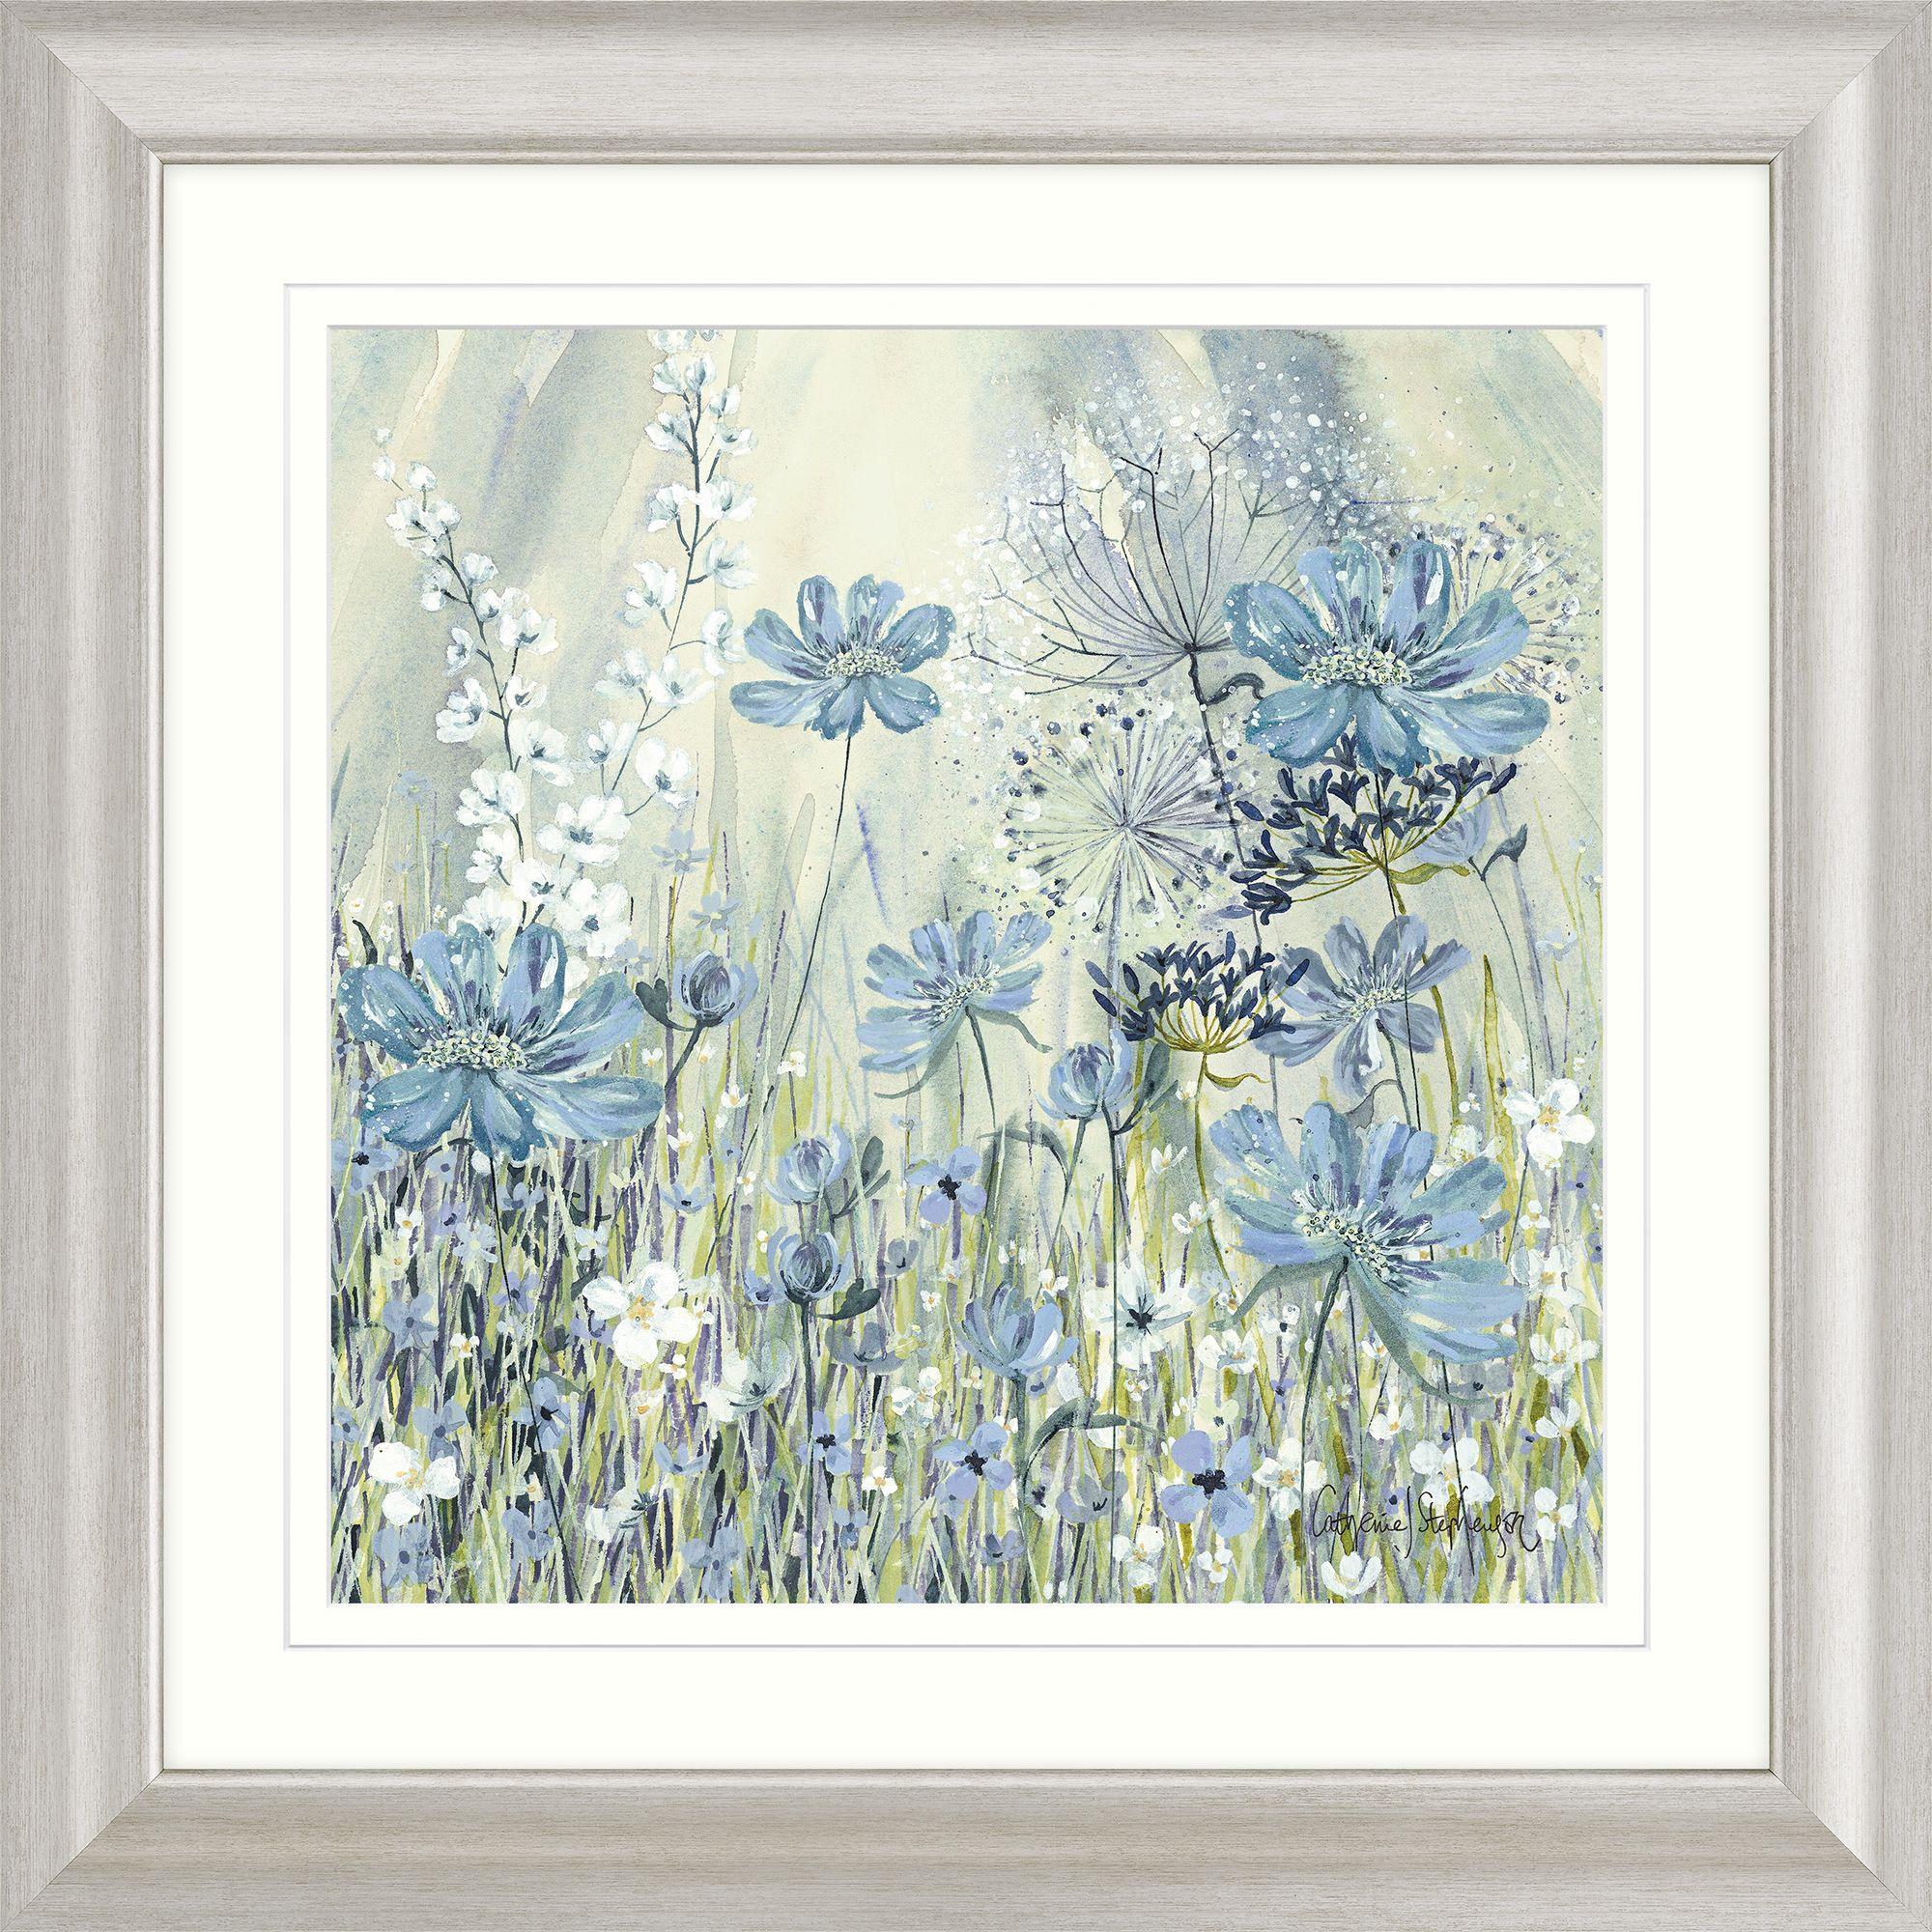 Catherine Stephenson Powder Blue Flowers I Framed Print & Mount, 68.5 x 68.5cm